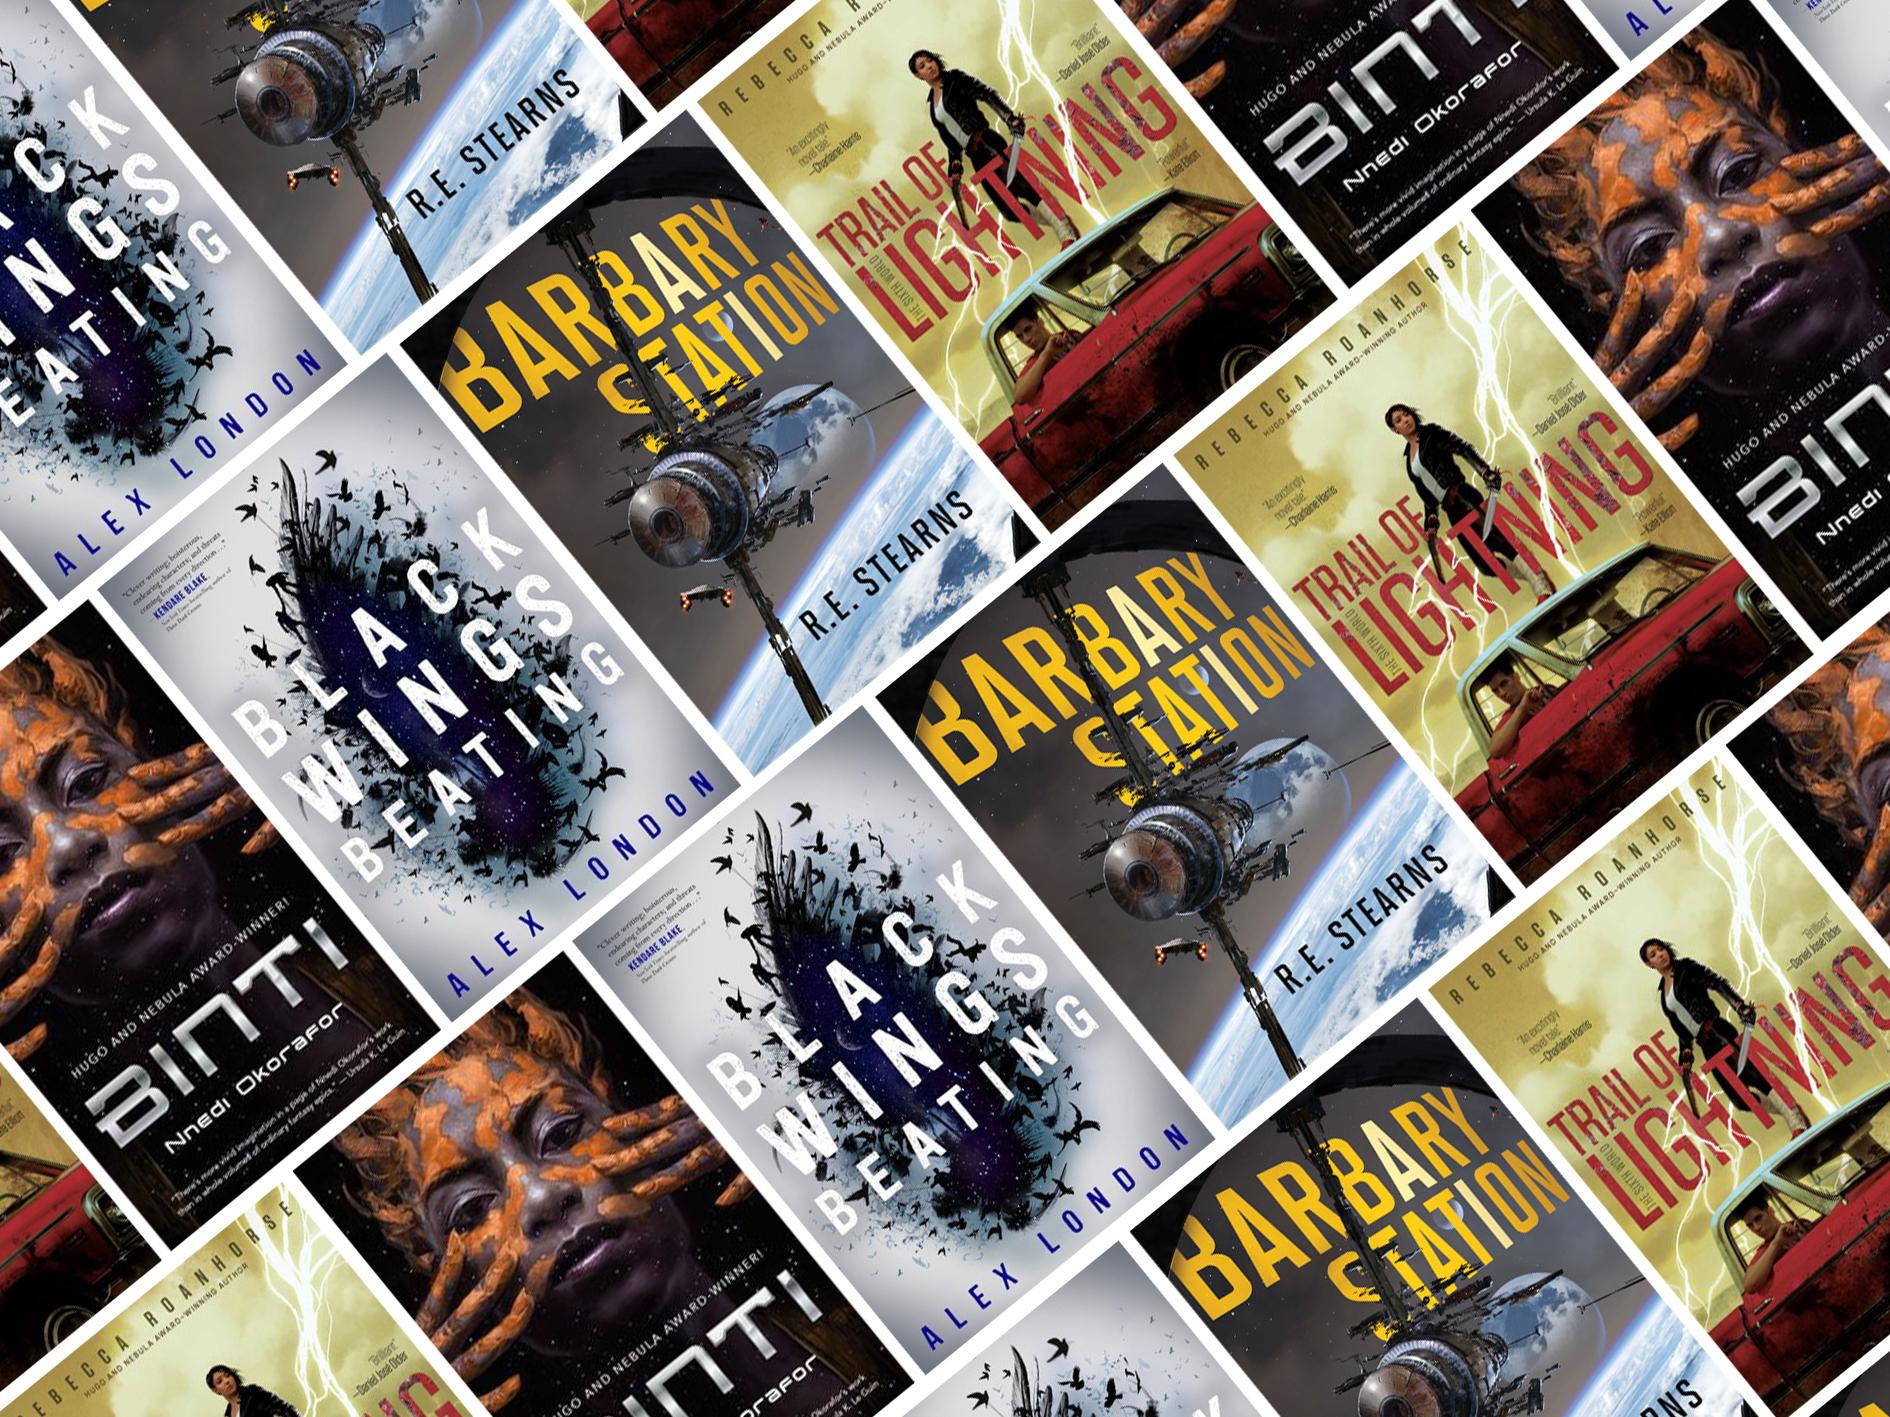 best sci-fi and fantasy books